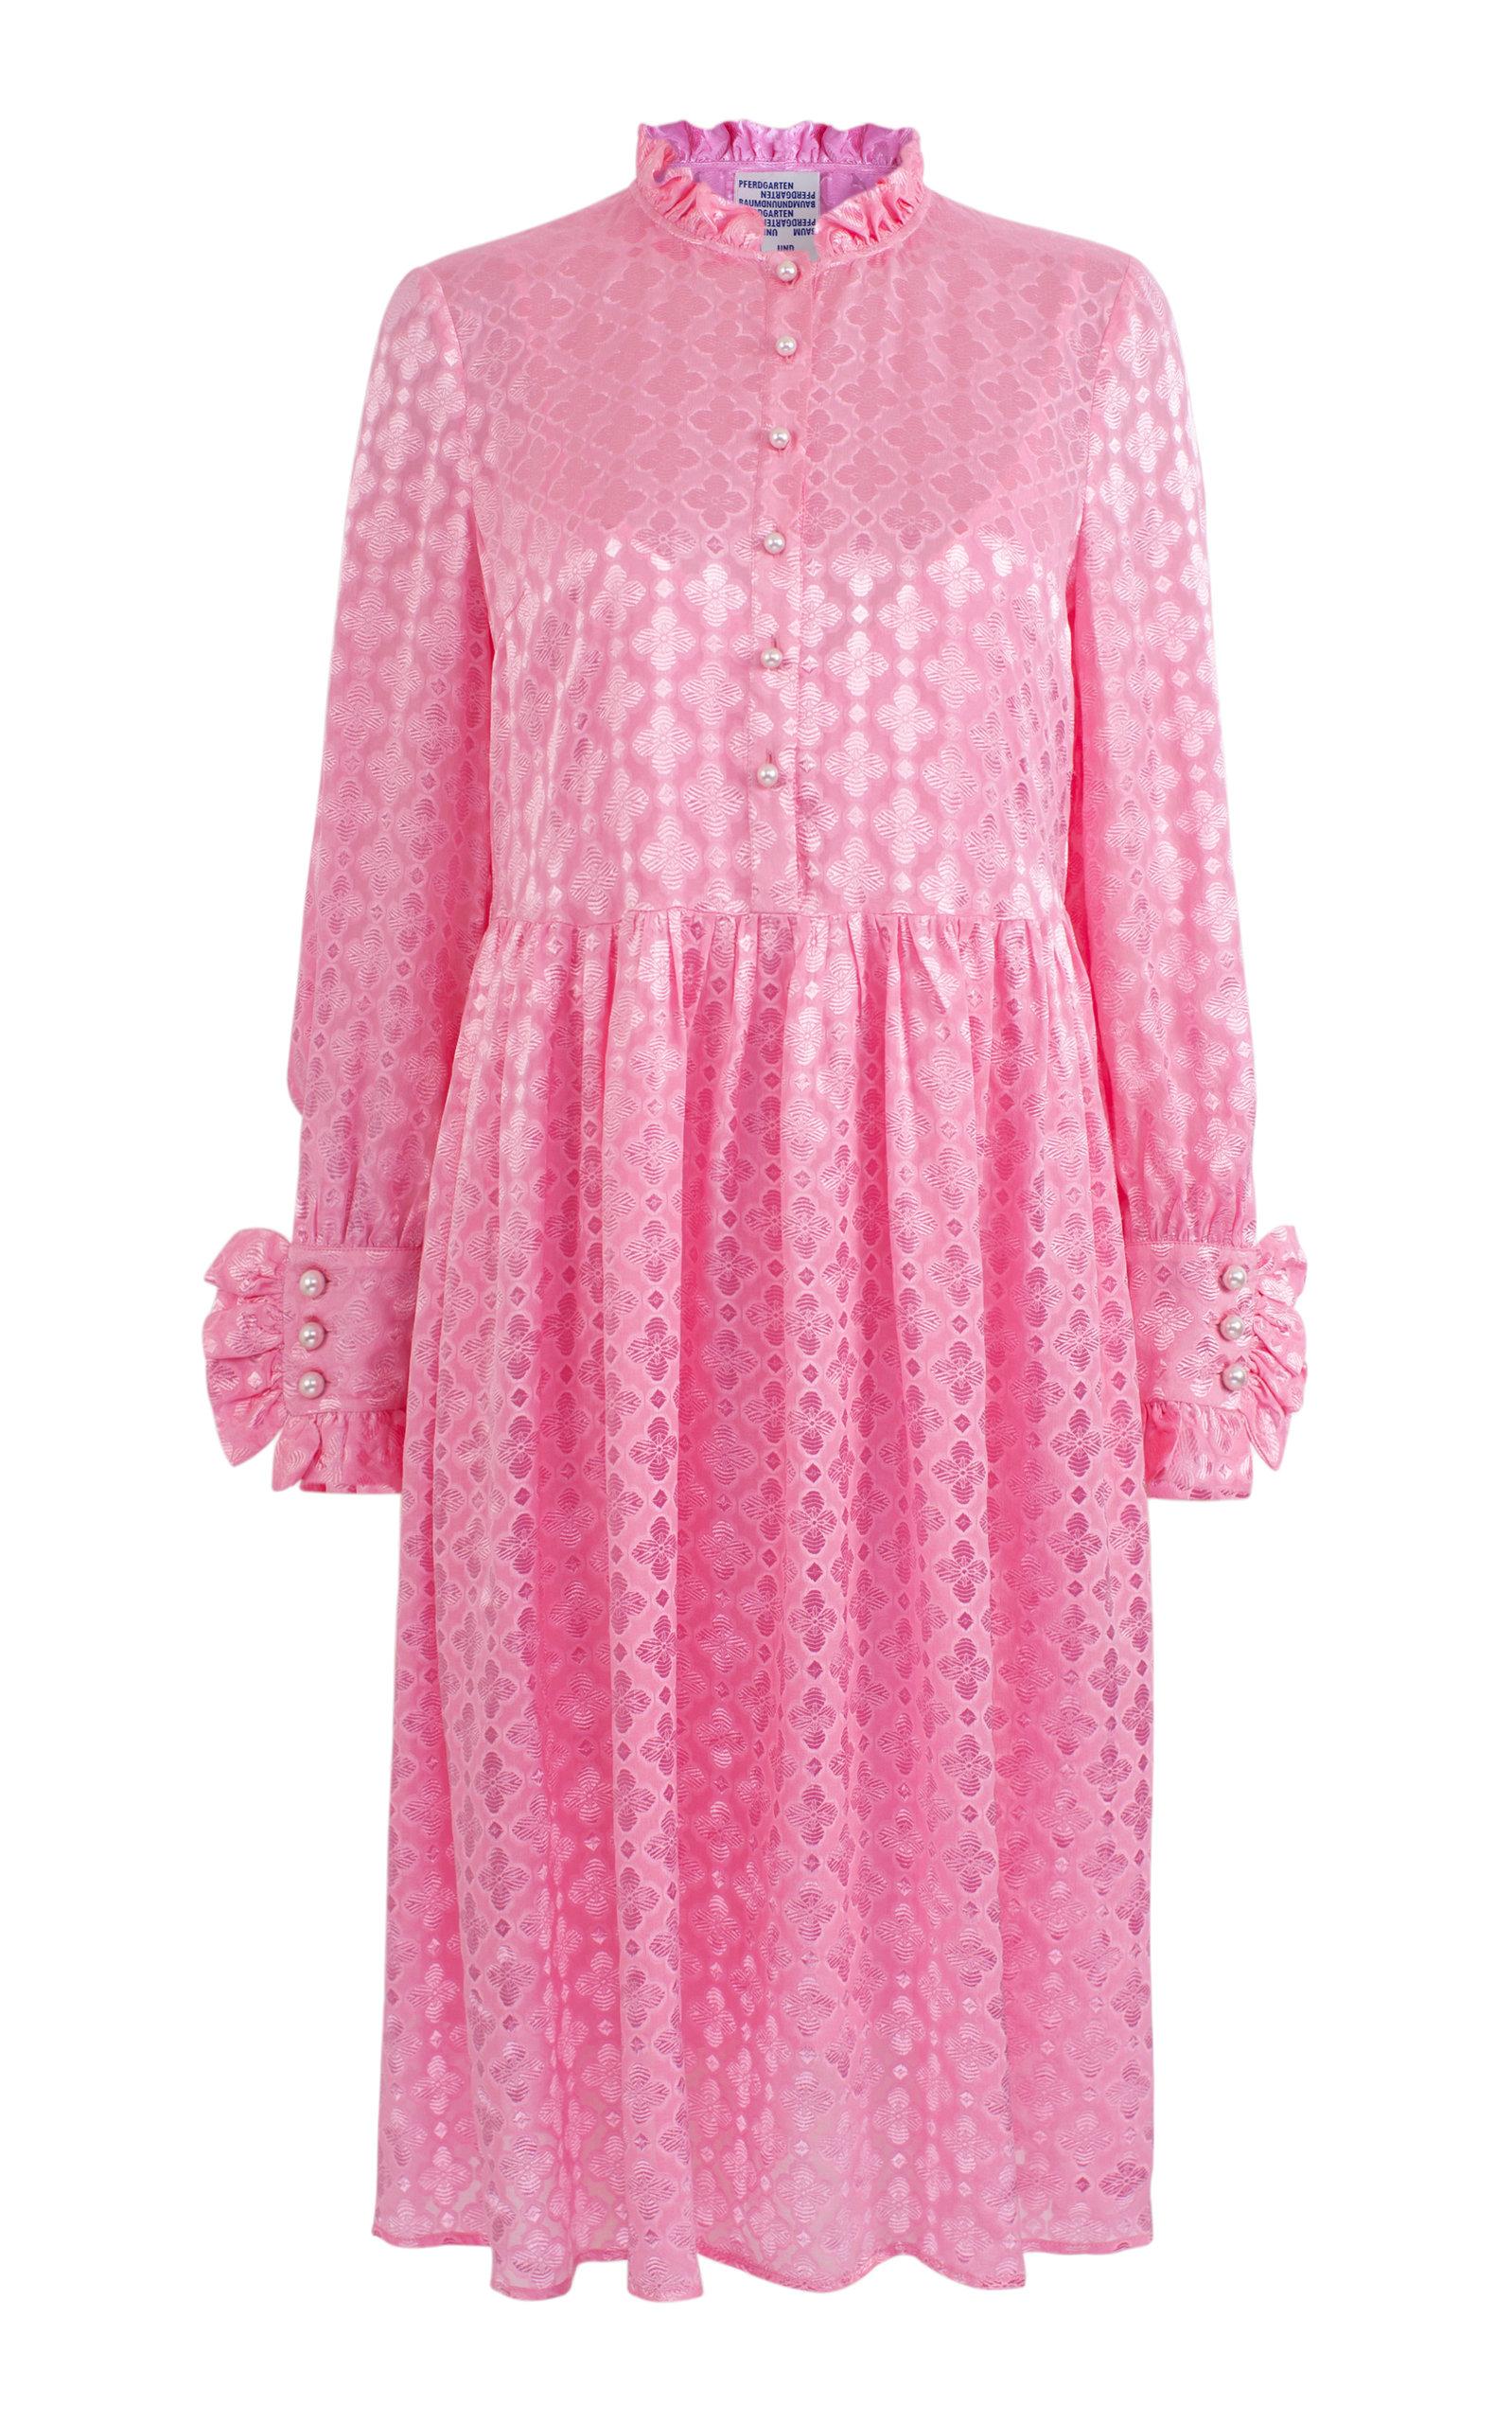 Baum By Knee Und Operandi Length Pferdgarten Pink Agacia Dress Moda nTYXPIxq